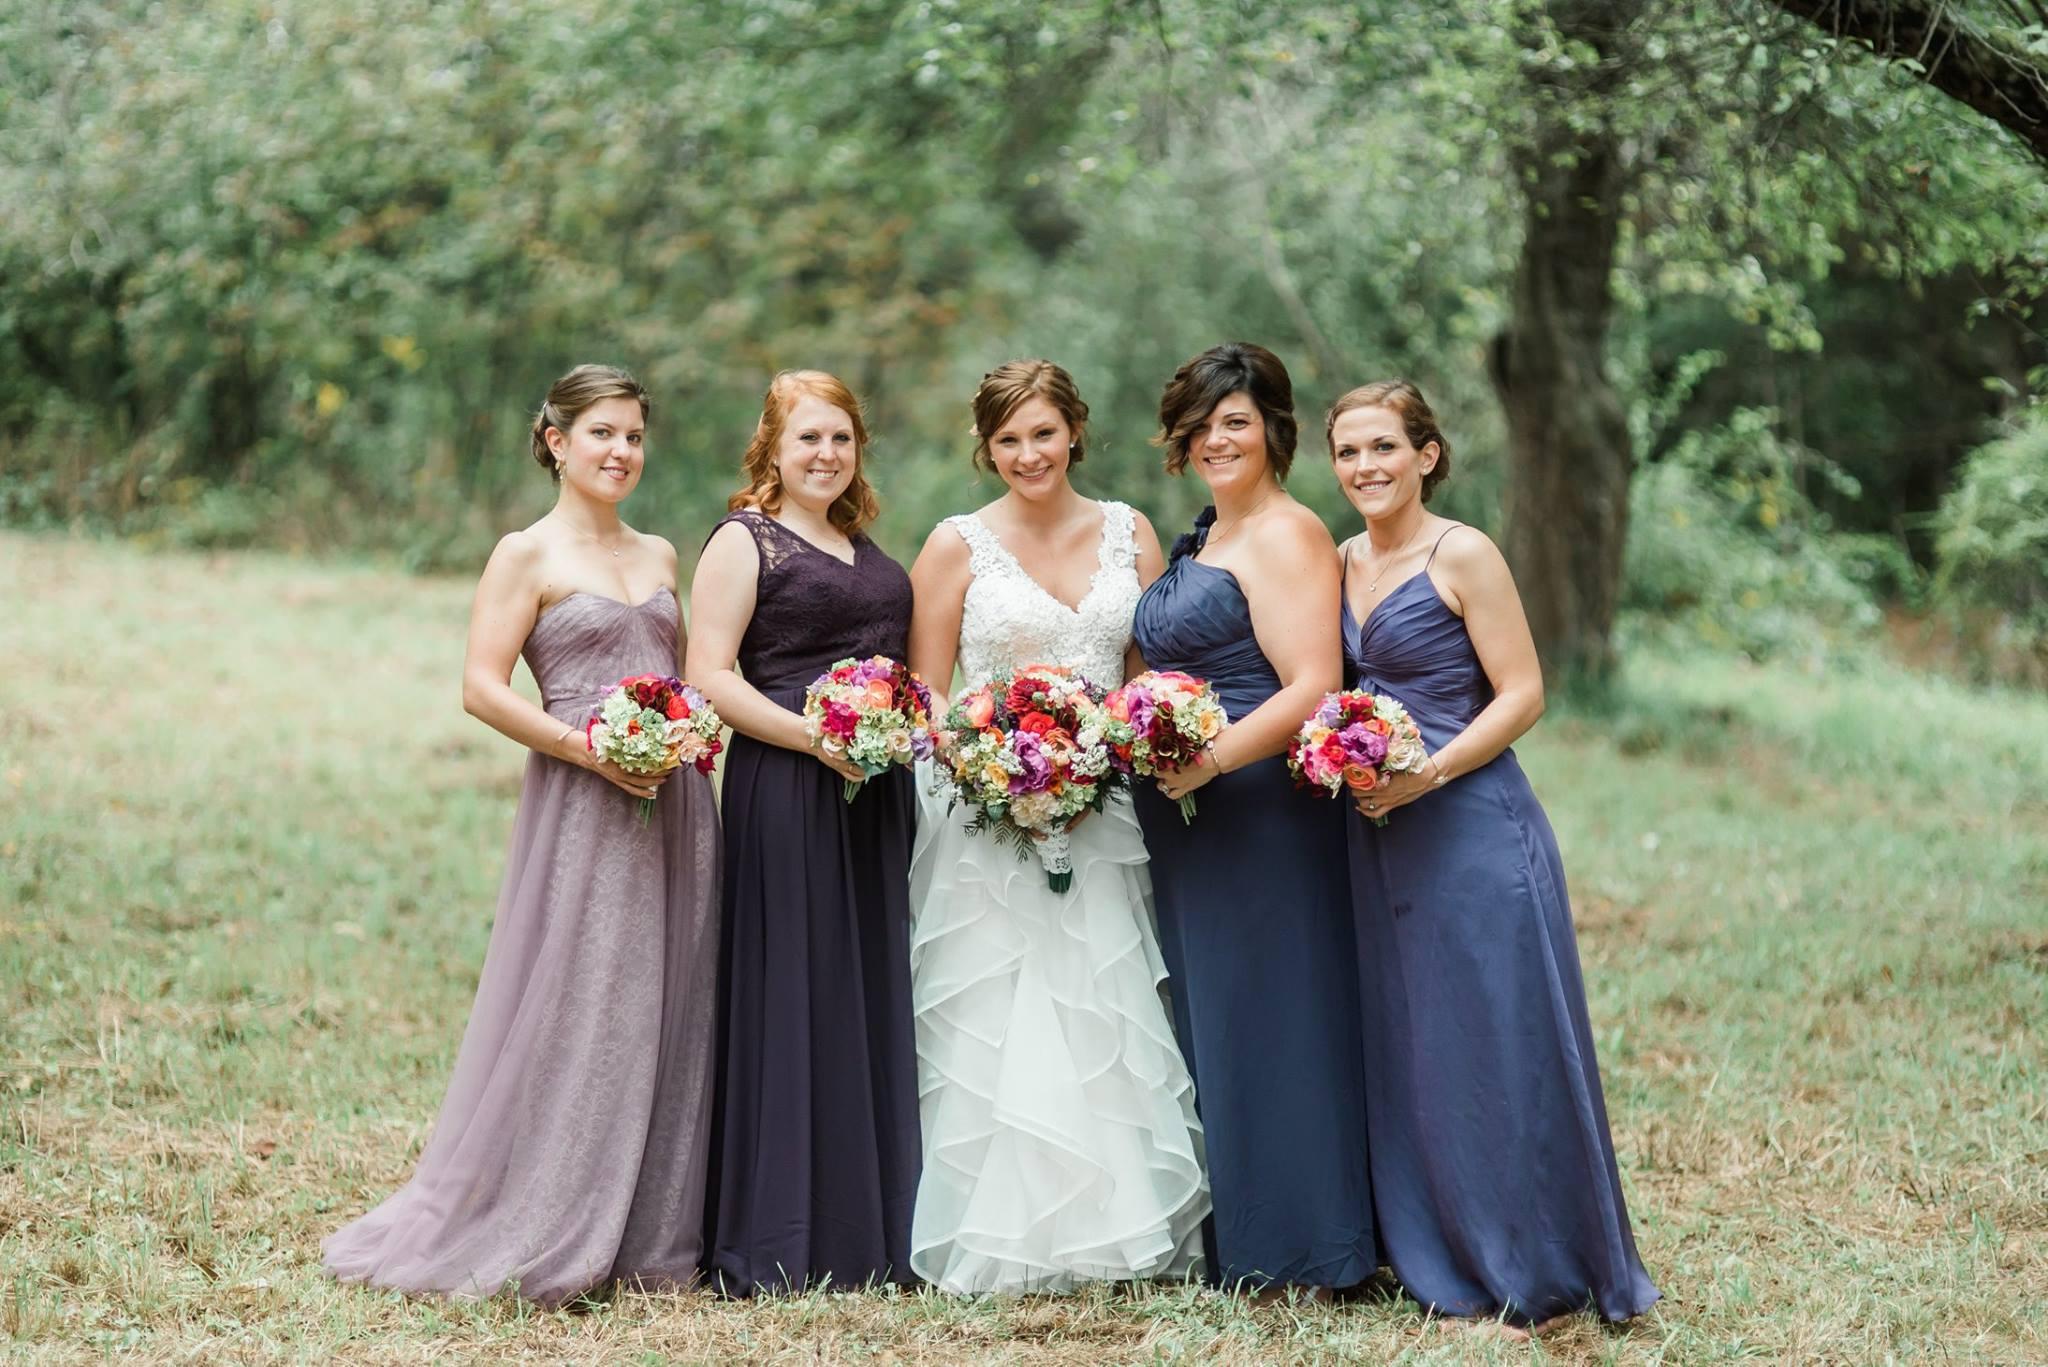 pennsylvania-backyard-wedding-love-diy-bohemian-romantic-colorful-0016.jpg